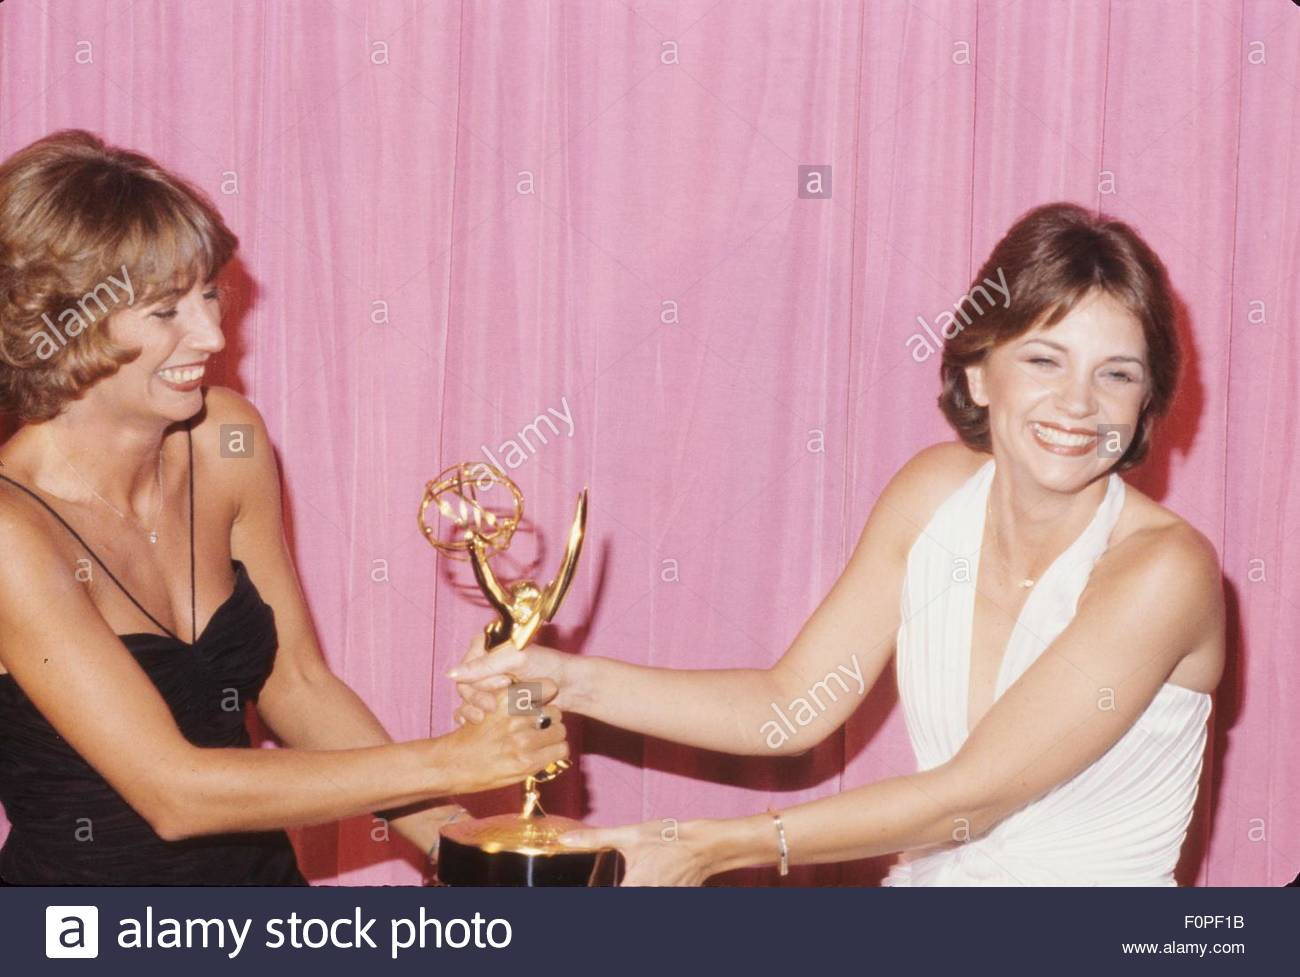 Geraldine Villarruz Asis (b. 1965),Susan Silo Erotic fotos Ingrid Seynhaeve BEL 3 1995, 1997, 2000,Jackie Richardson